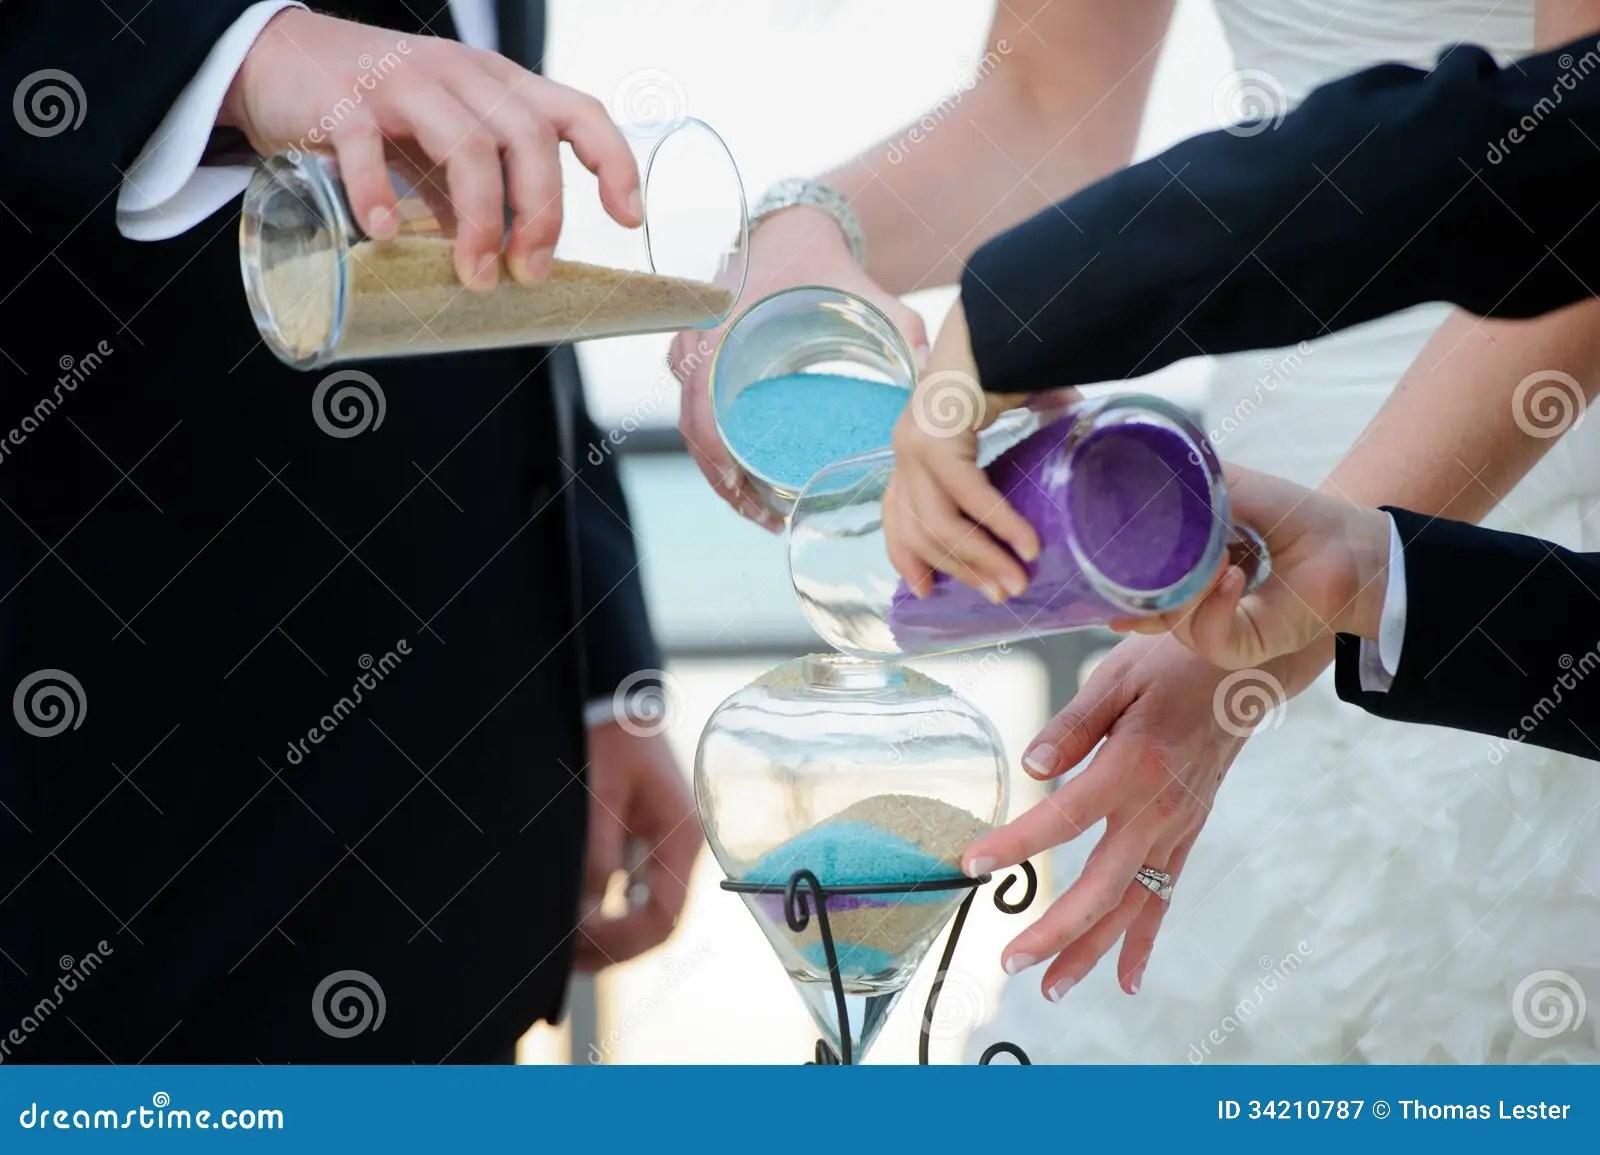 how to do a unity sand ceremony wedding sand ceremony